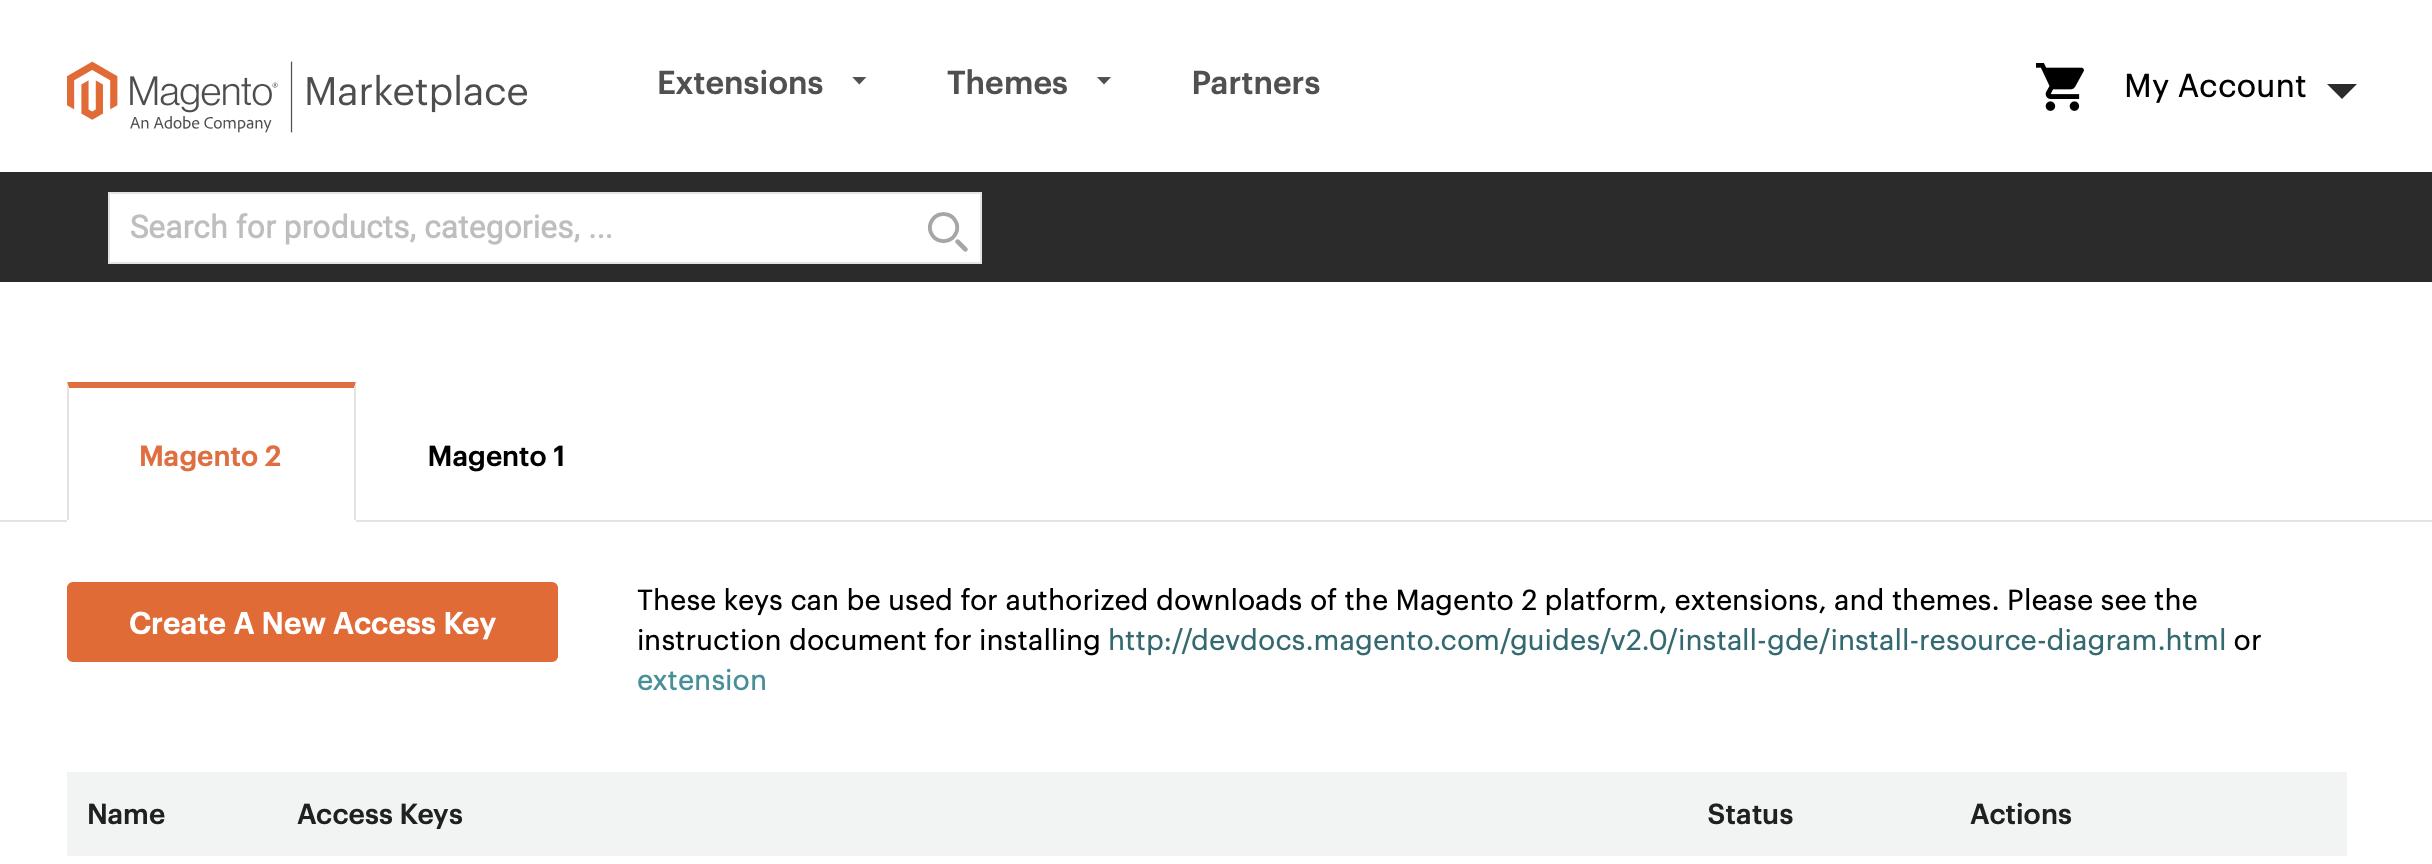 Magento Marketplace - Create a New Access Key